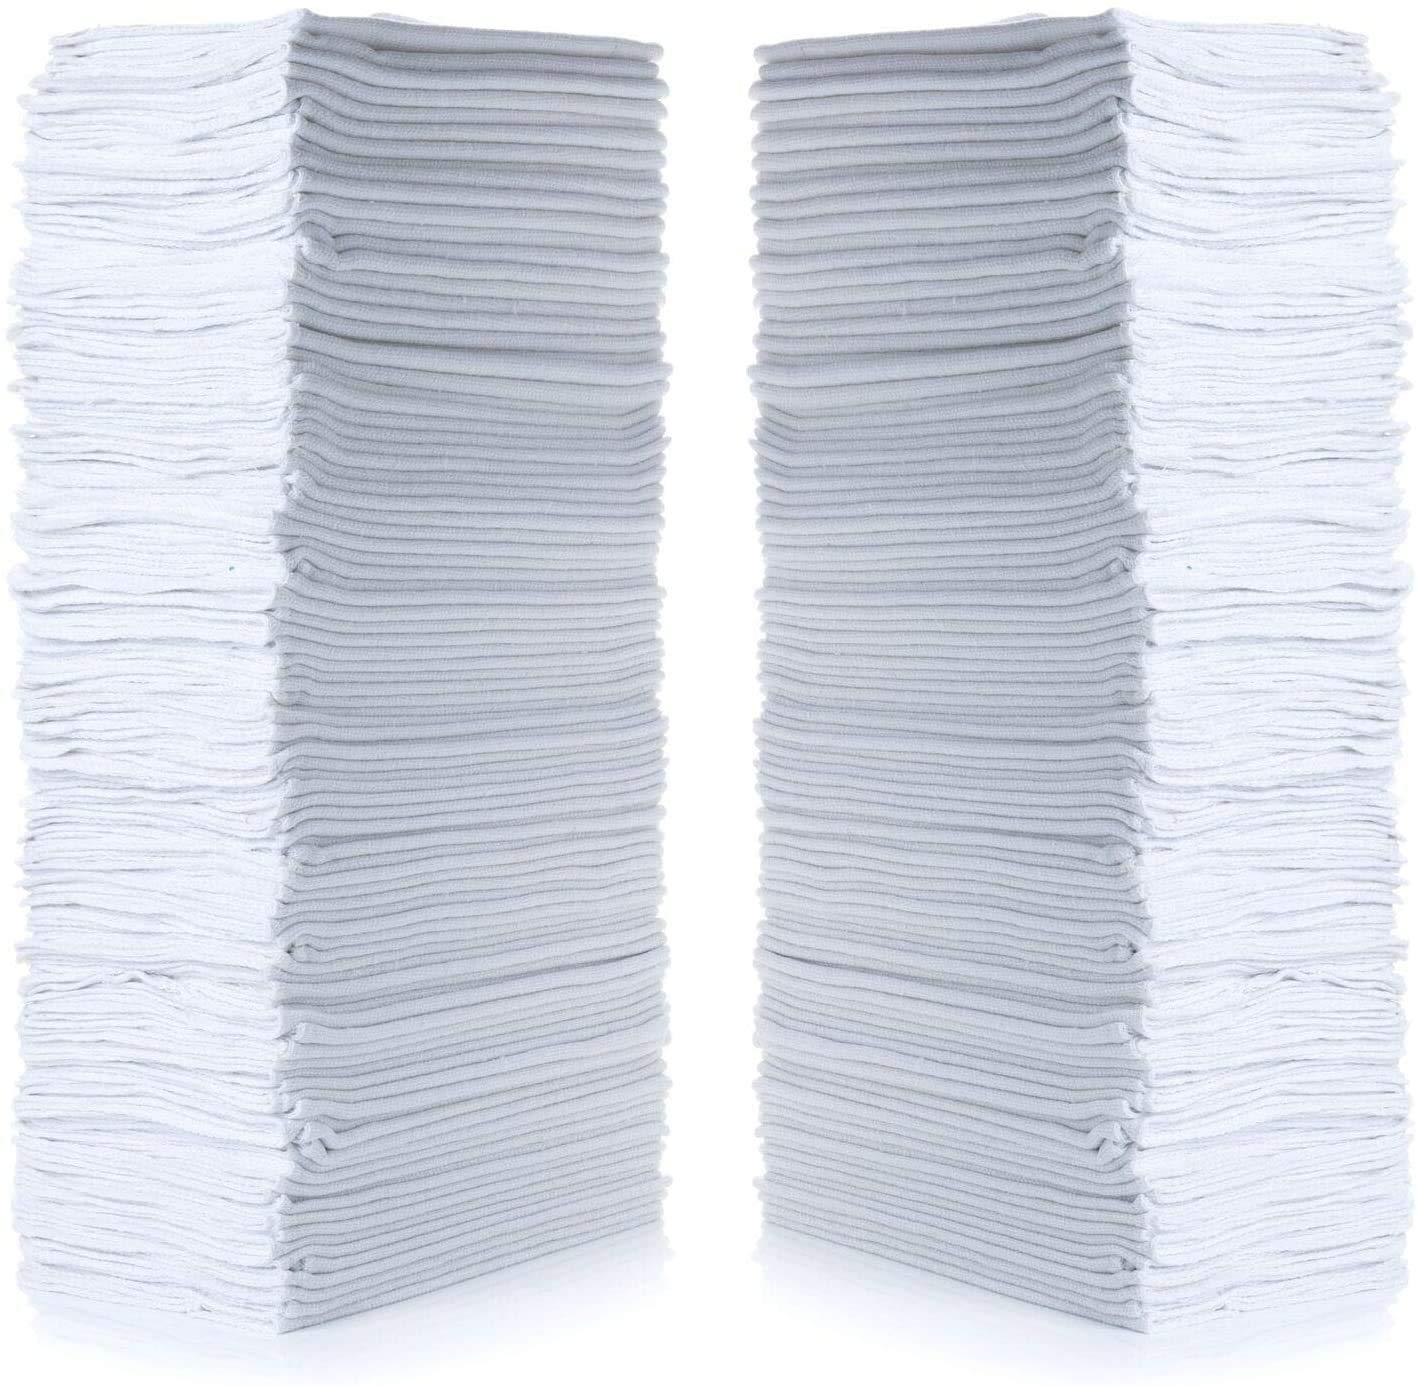 "Simpli-Magic 79100 Shop Towels, 14""x12"" Basic, White, 50 Pack"